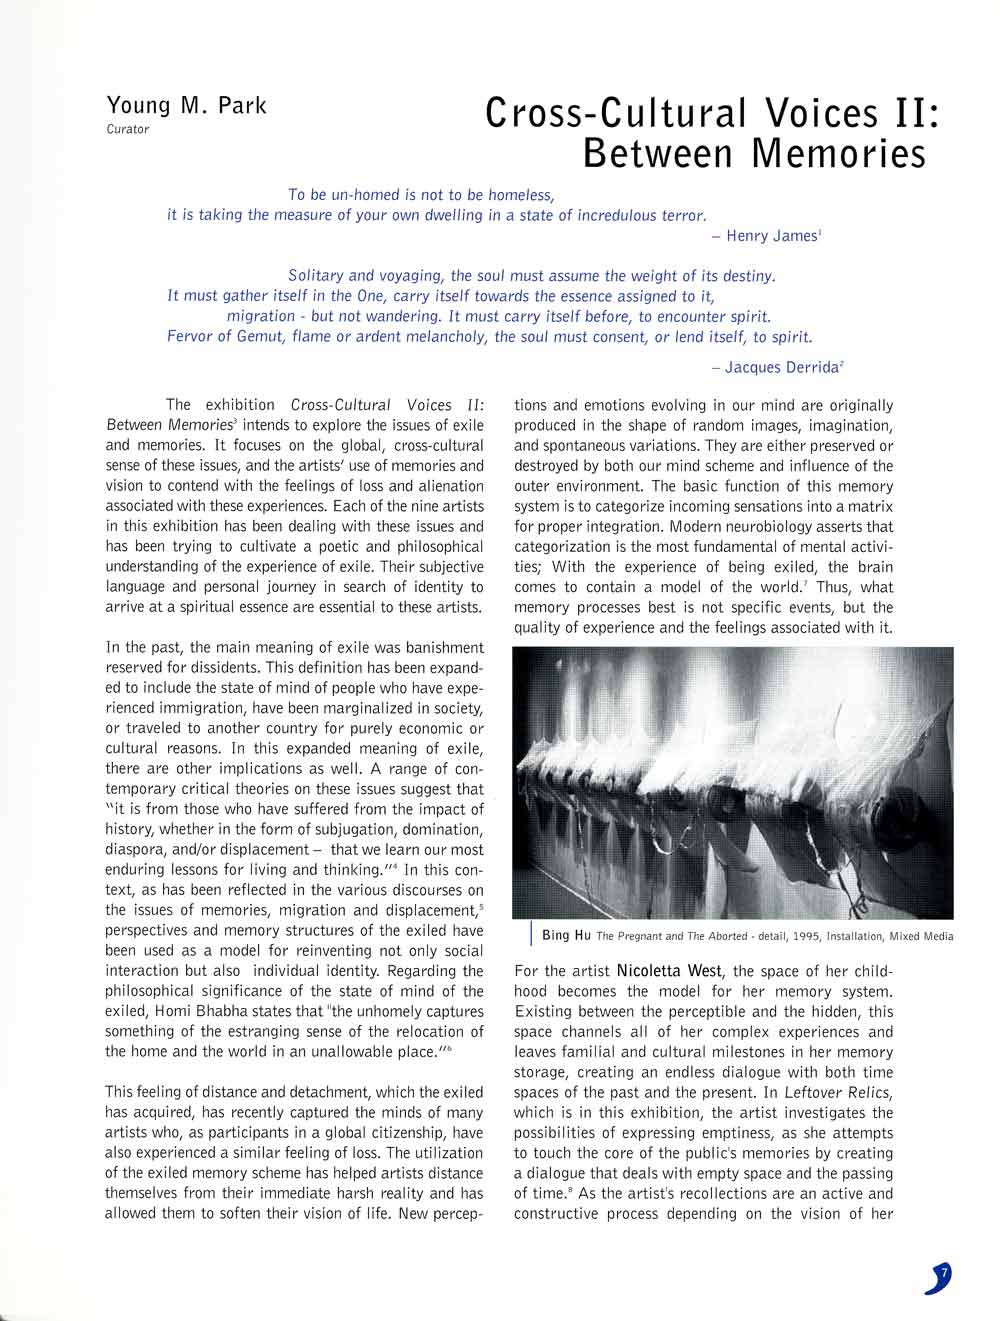 Cross-Cultural Voices II, exhibition catalog, pg 4